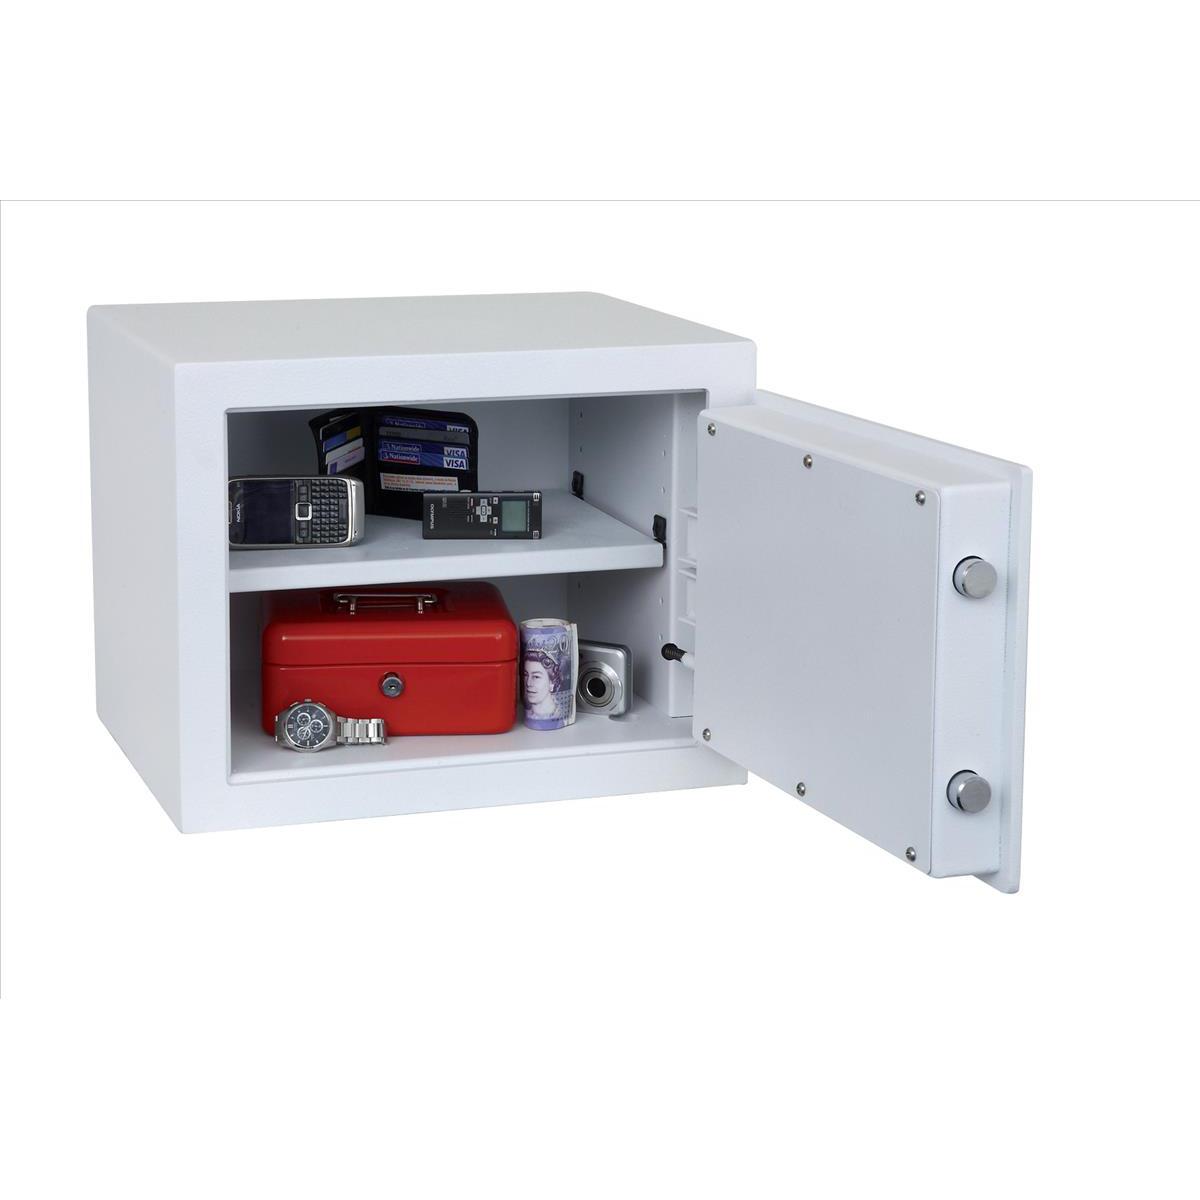 Phoenix Fortress High Security Safe Key Lock 24L Capacity 25kg W450xD350xH350mm Ref SS1182K